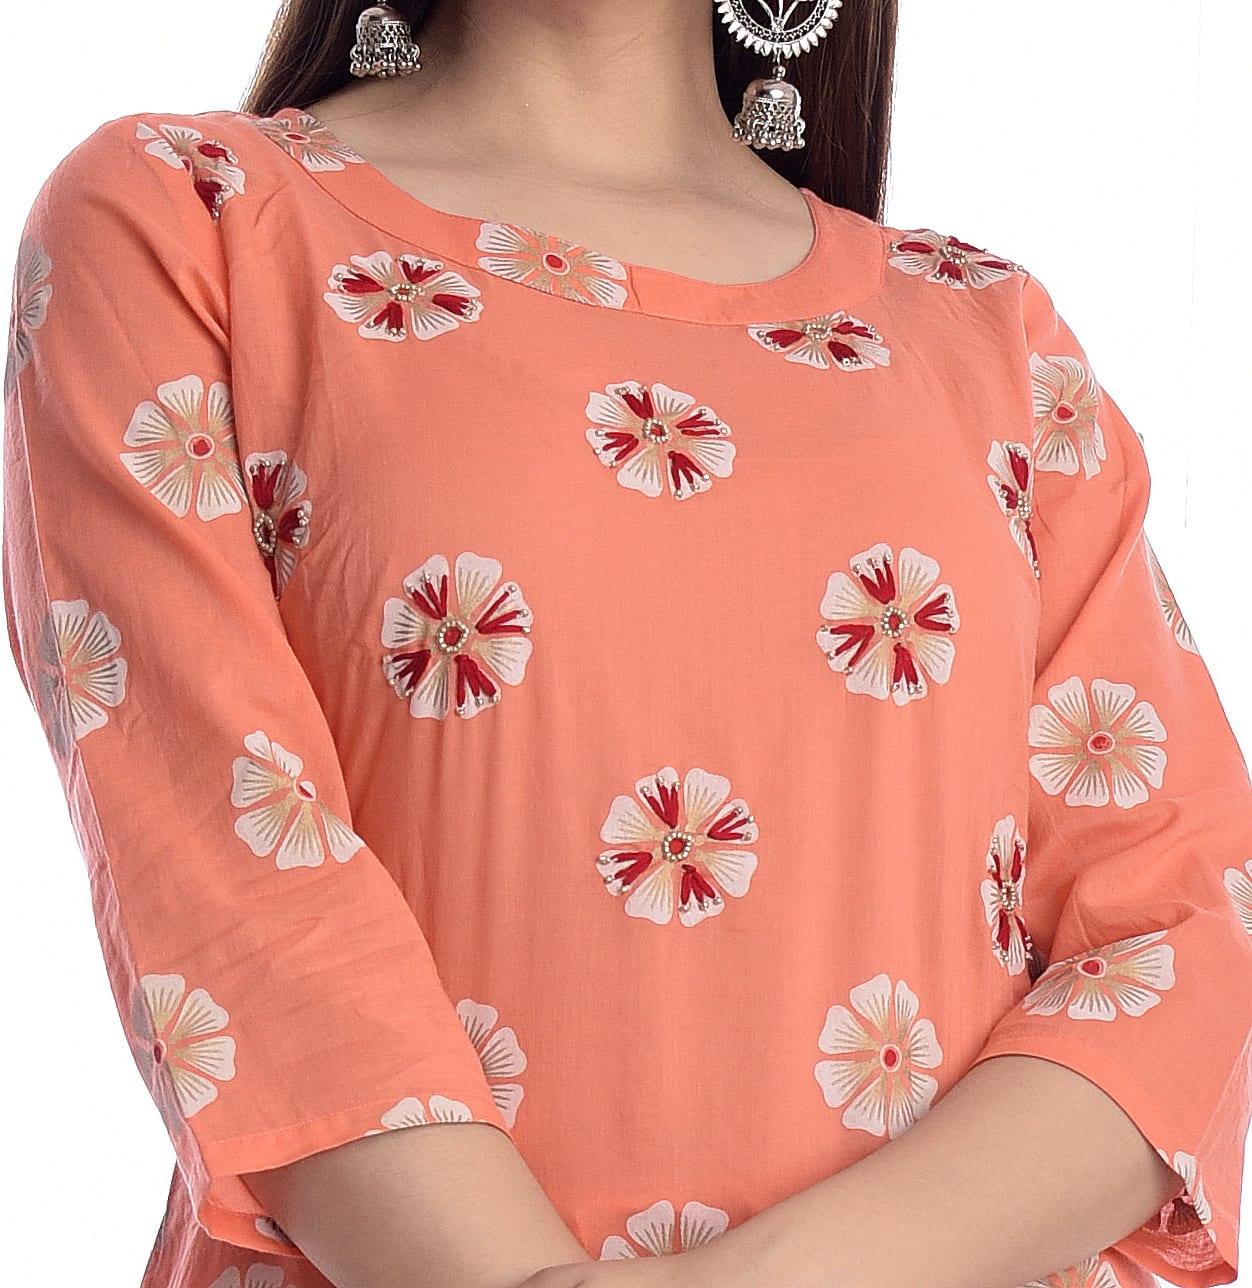 Jaipur Kurti Manufacturer | Jaipur Kurti Wholesale | Jaipur Kurti Wholesale Market | NSPL Impax